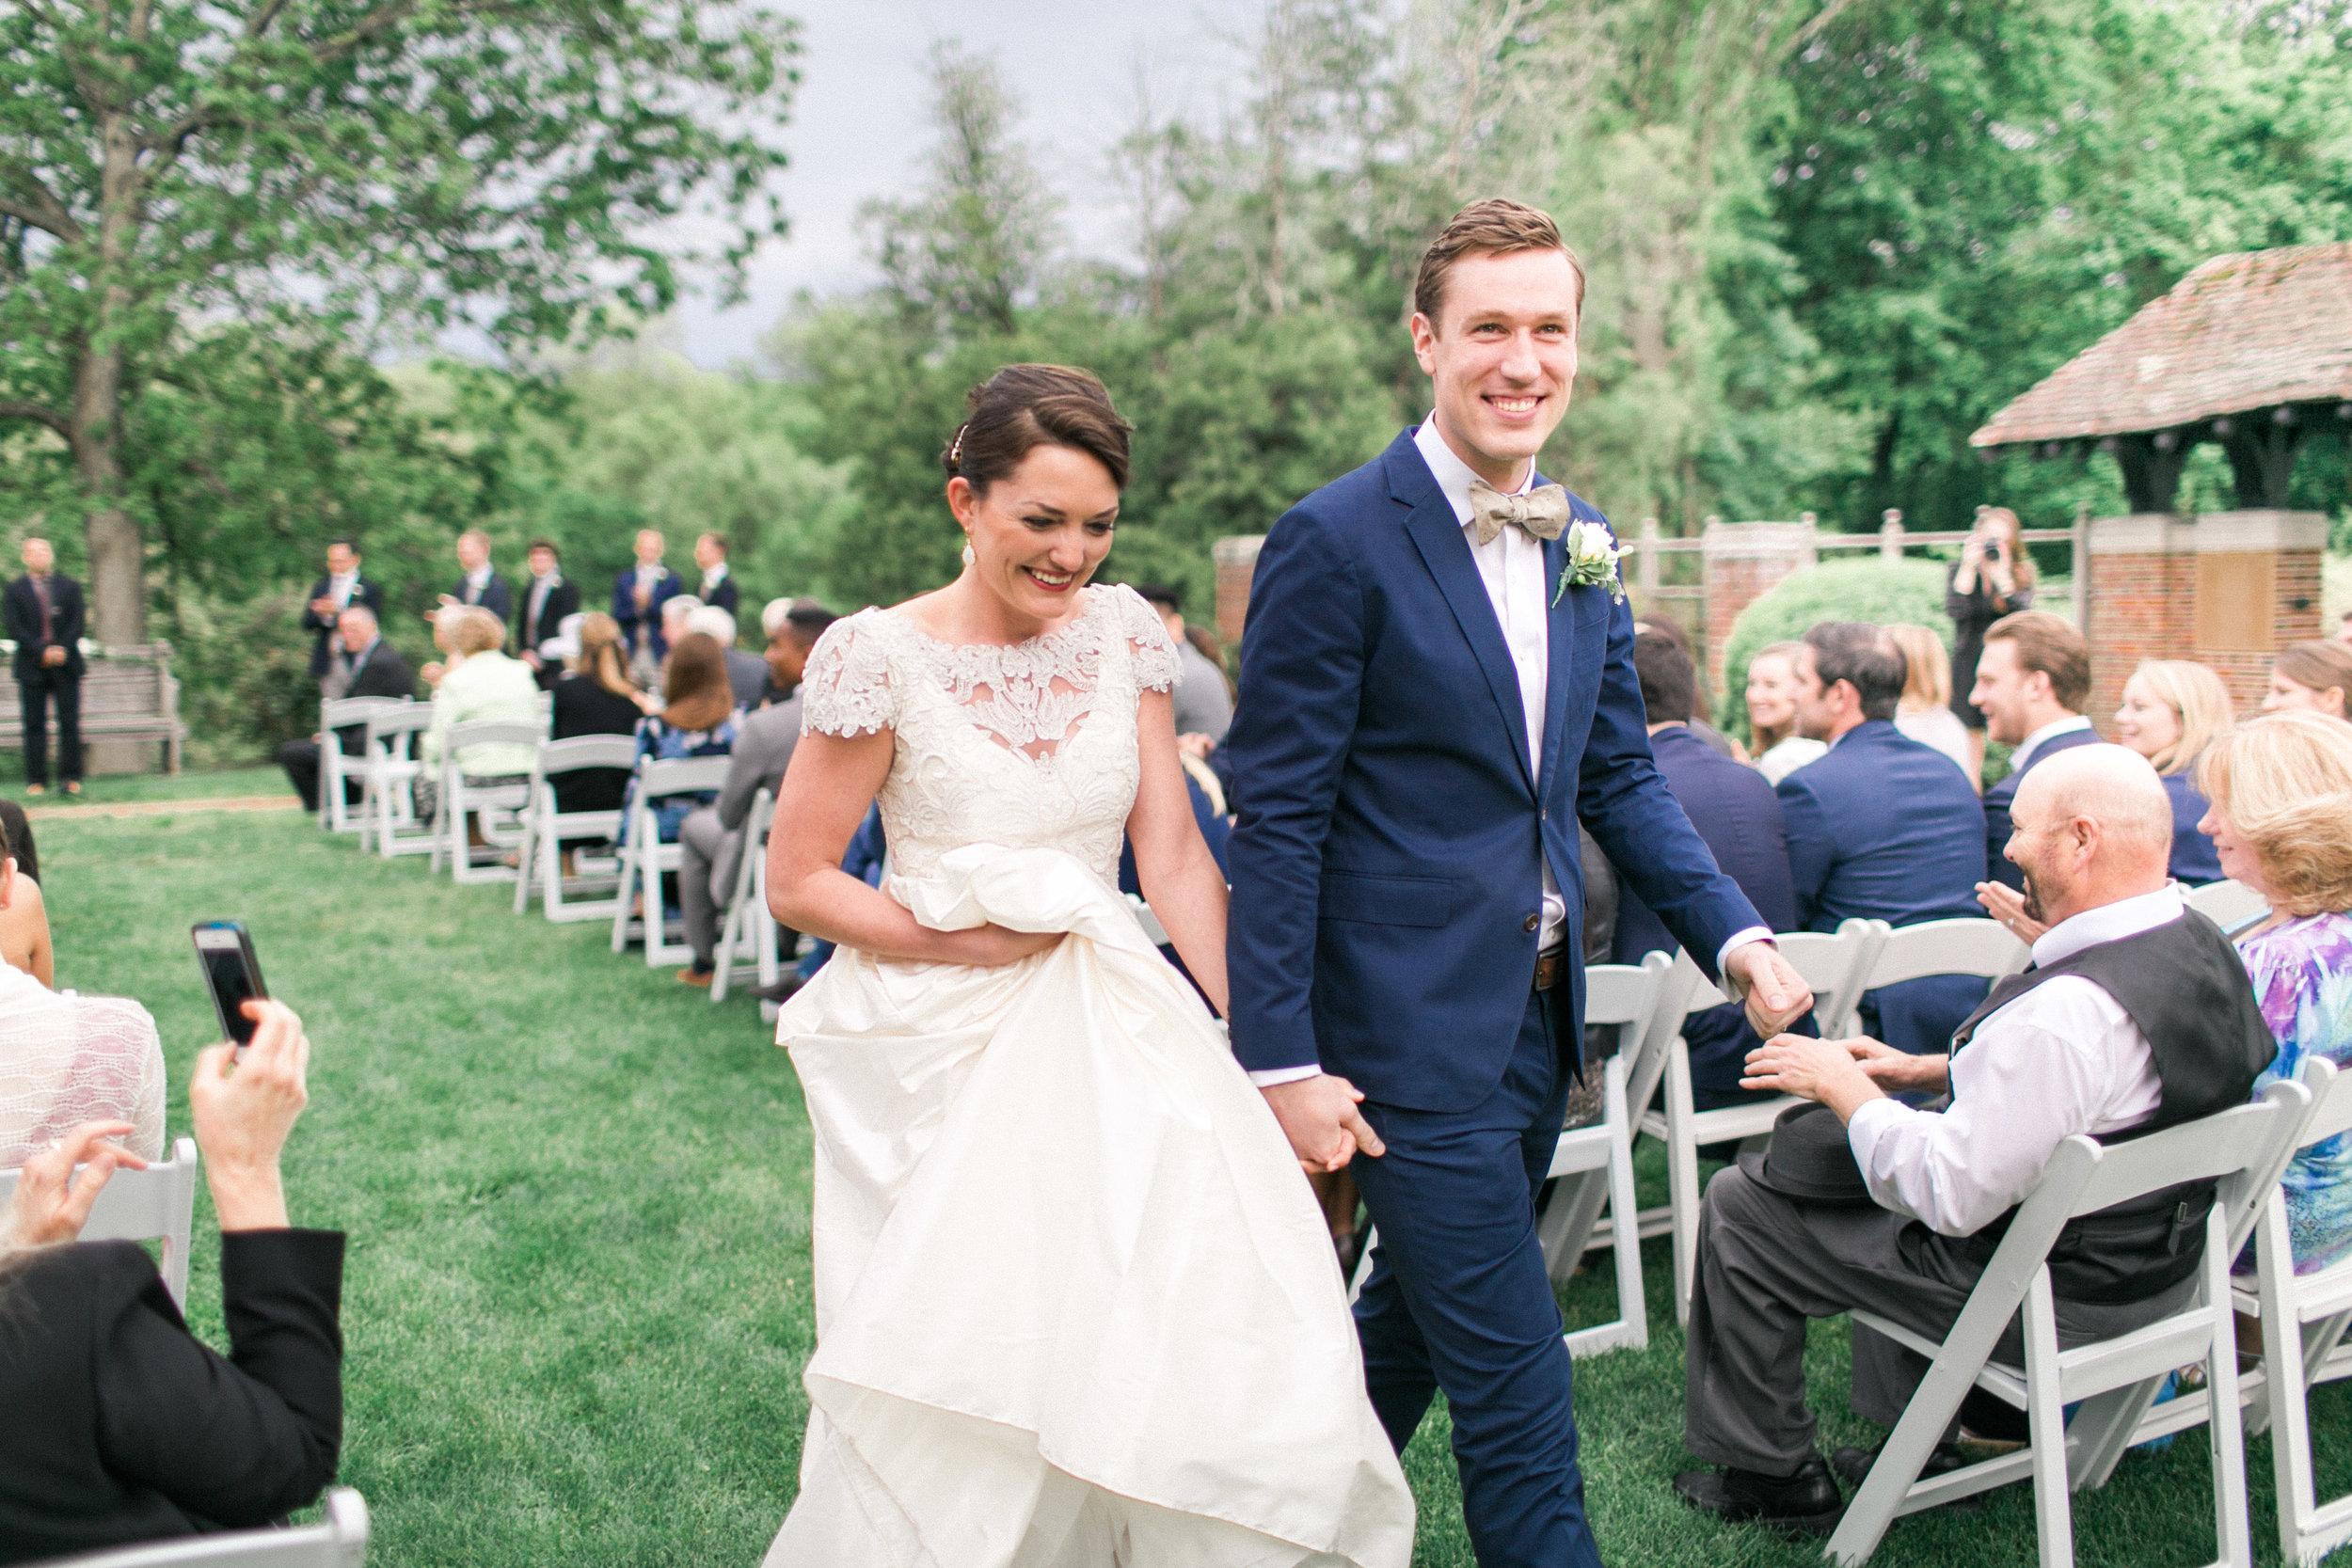 mayden photography weddings-75.jpg